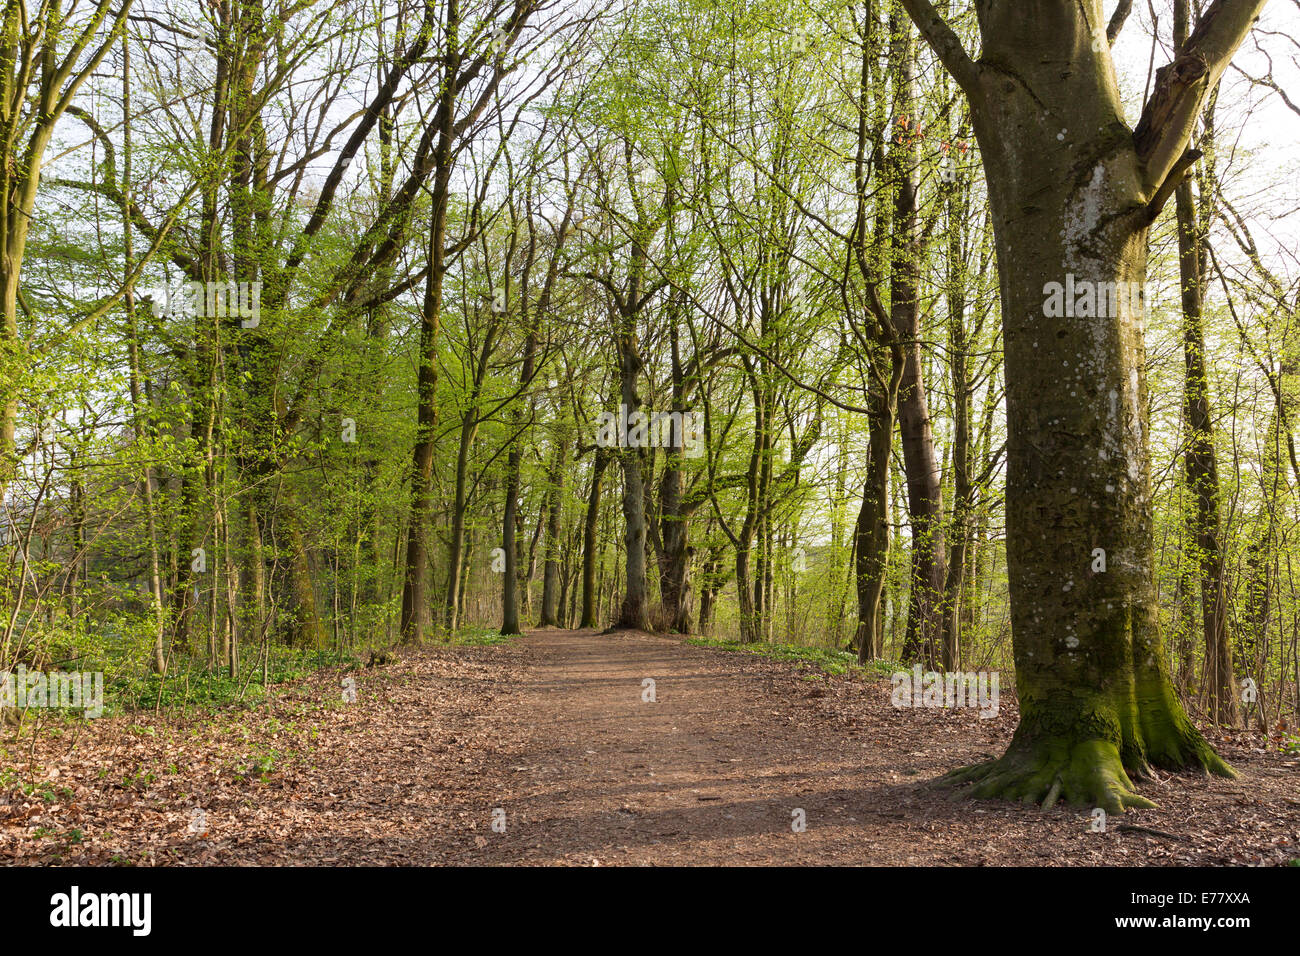 Old giant trees Tilia Linden alte Baeume spring - Stock Image